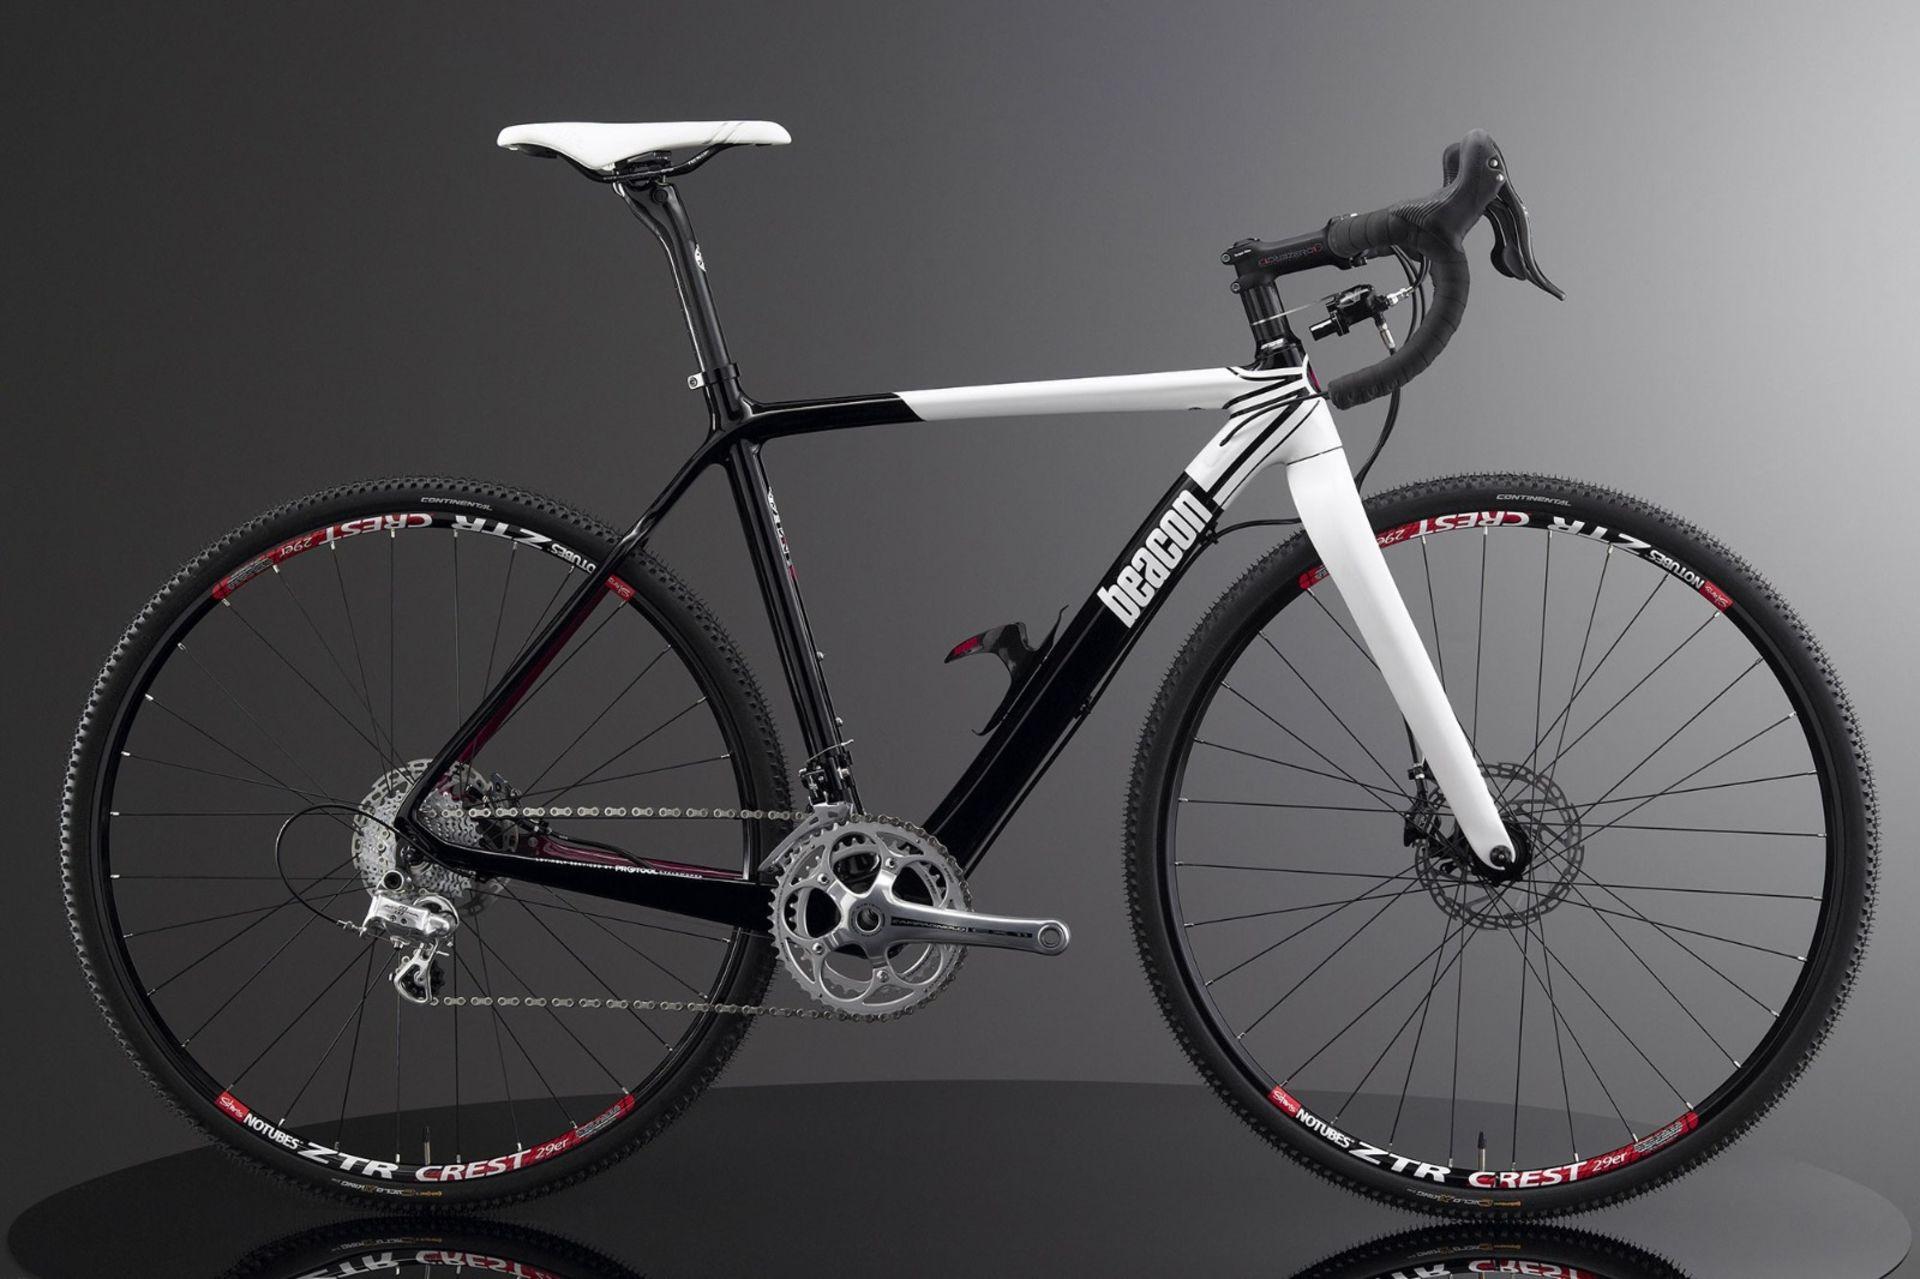 Lot 16 - 1 x Beacon Model BF-45, Size 520, Carbon Fibre Bike Frame in Black & White.